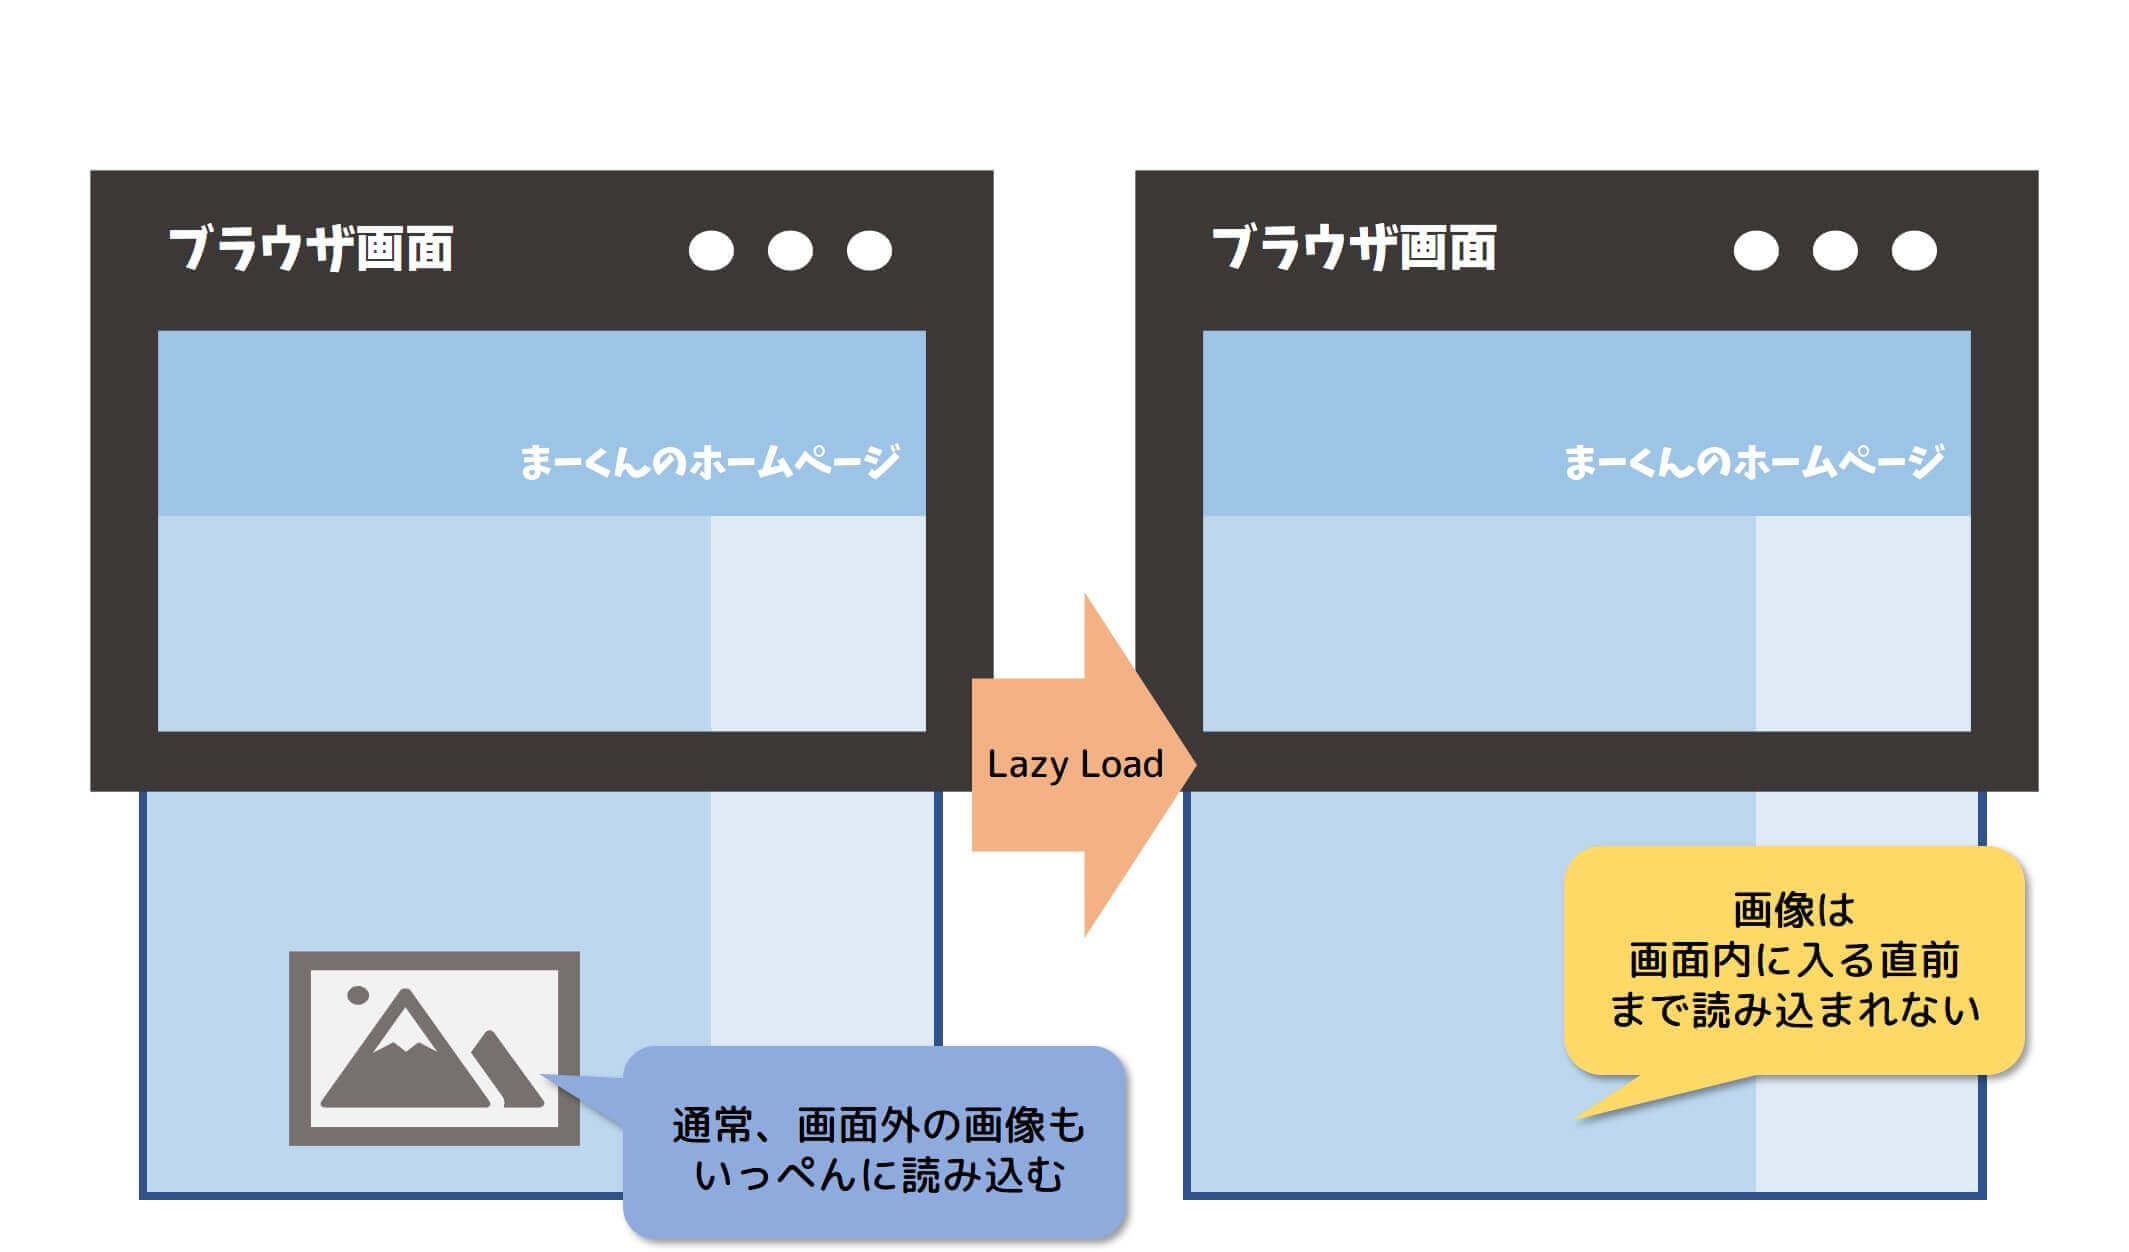 Lazy_Load_仕組み